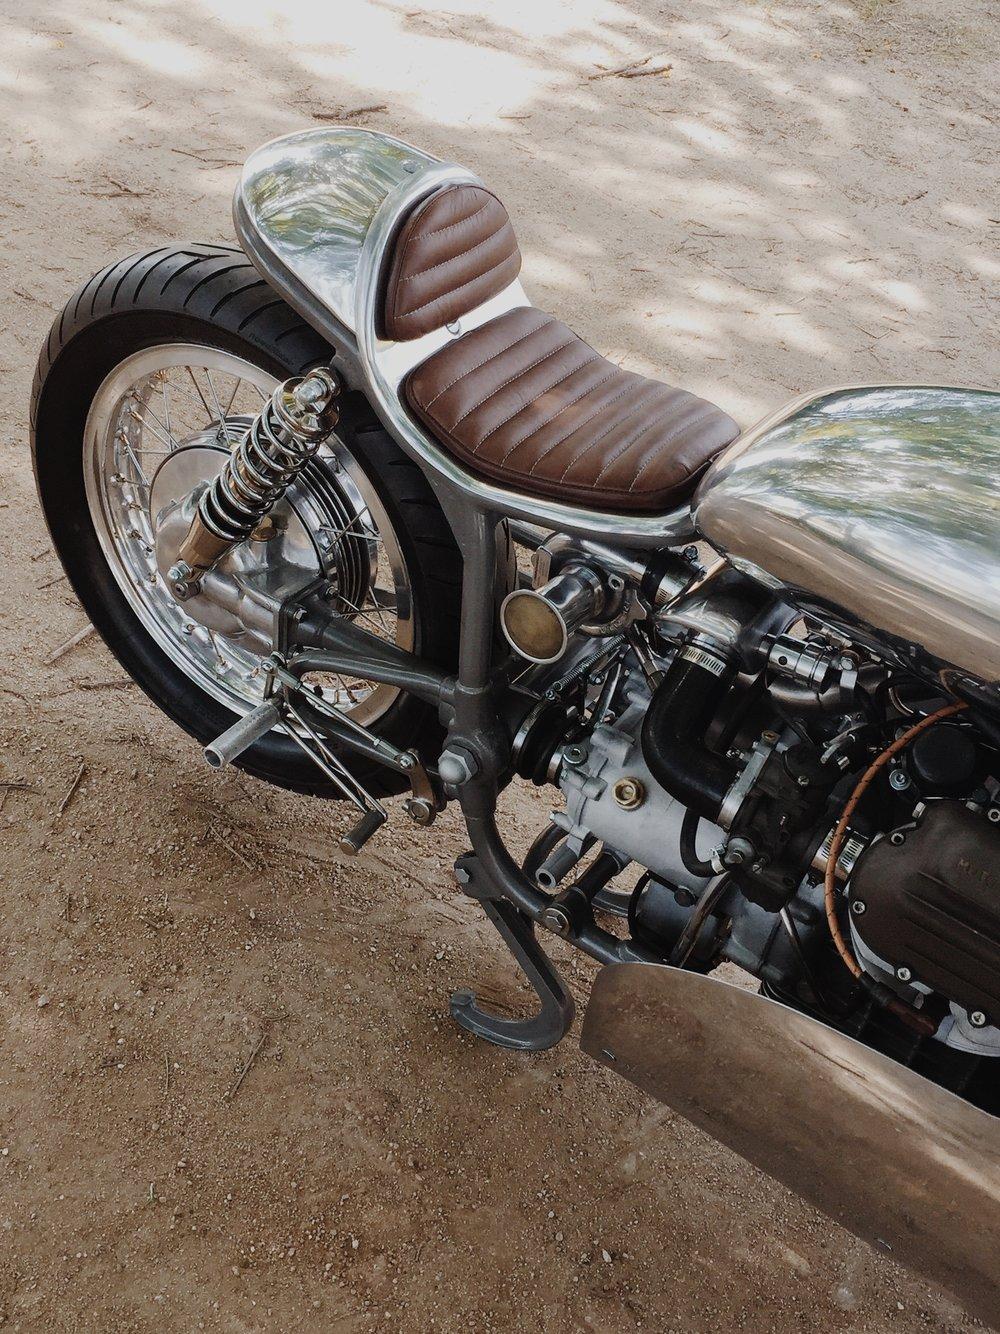 Craig_Rodsmith_Turbo_Moto-Guzzi_Dustbin_Moto-Mucci 2.jpg